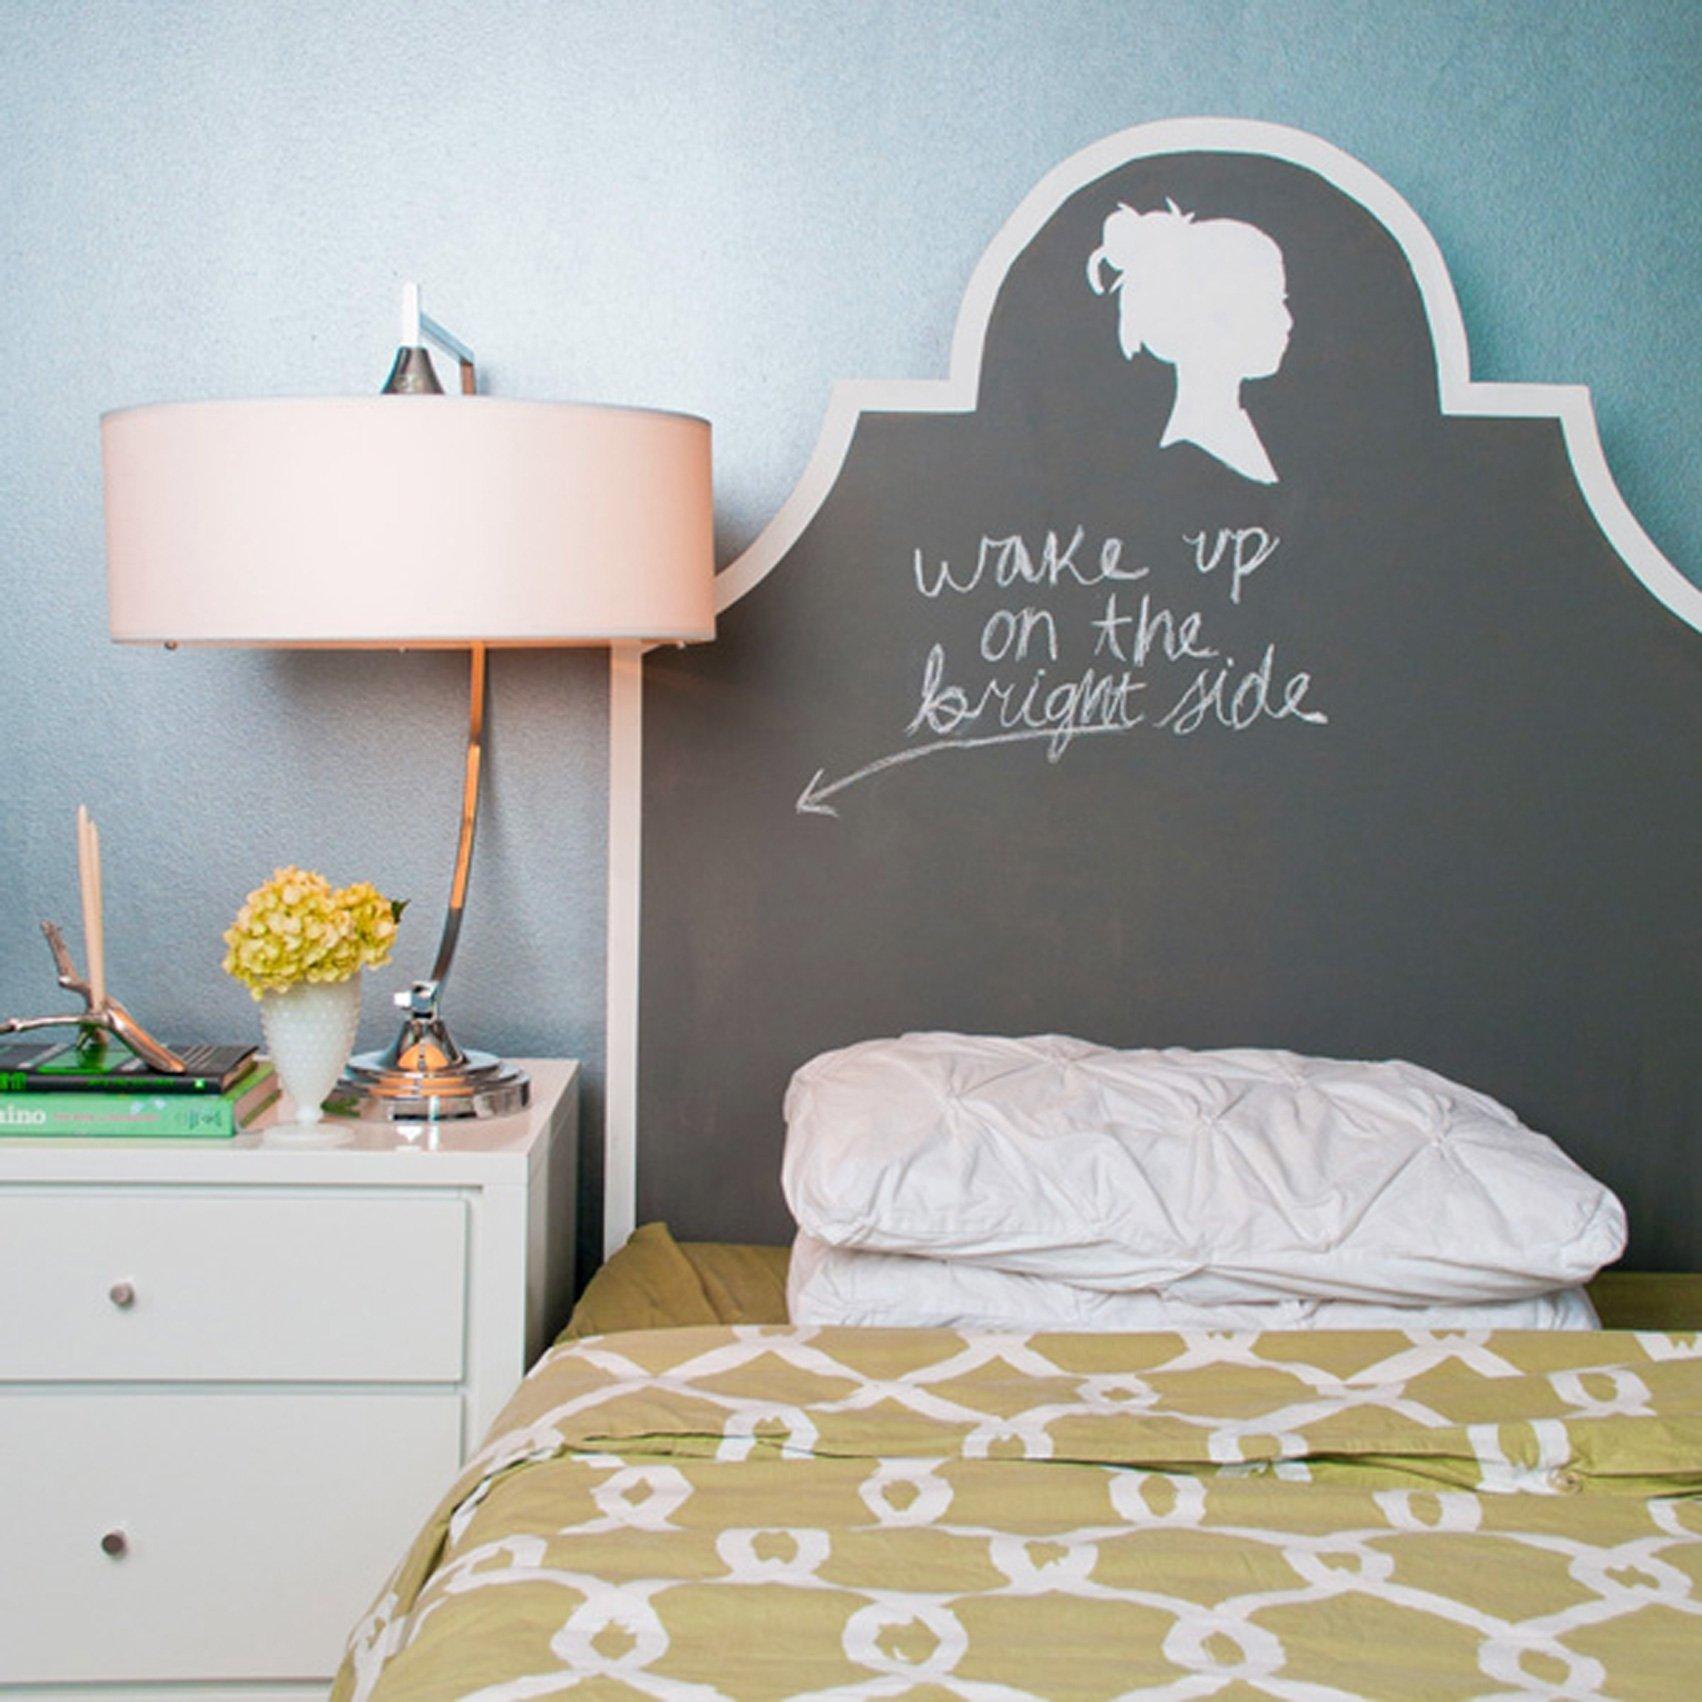 10 Great Do It Yourself Bedroom Ideas do it yourself bedroom ideas internetunblock internetunblock 2021